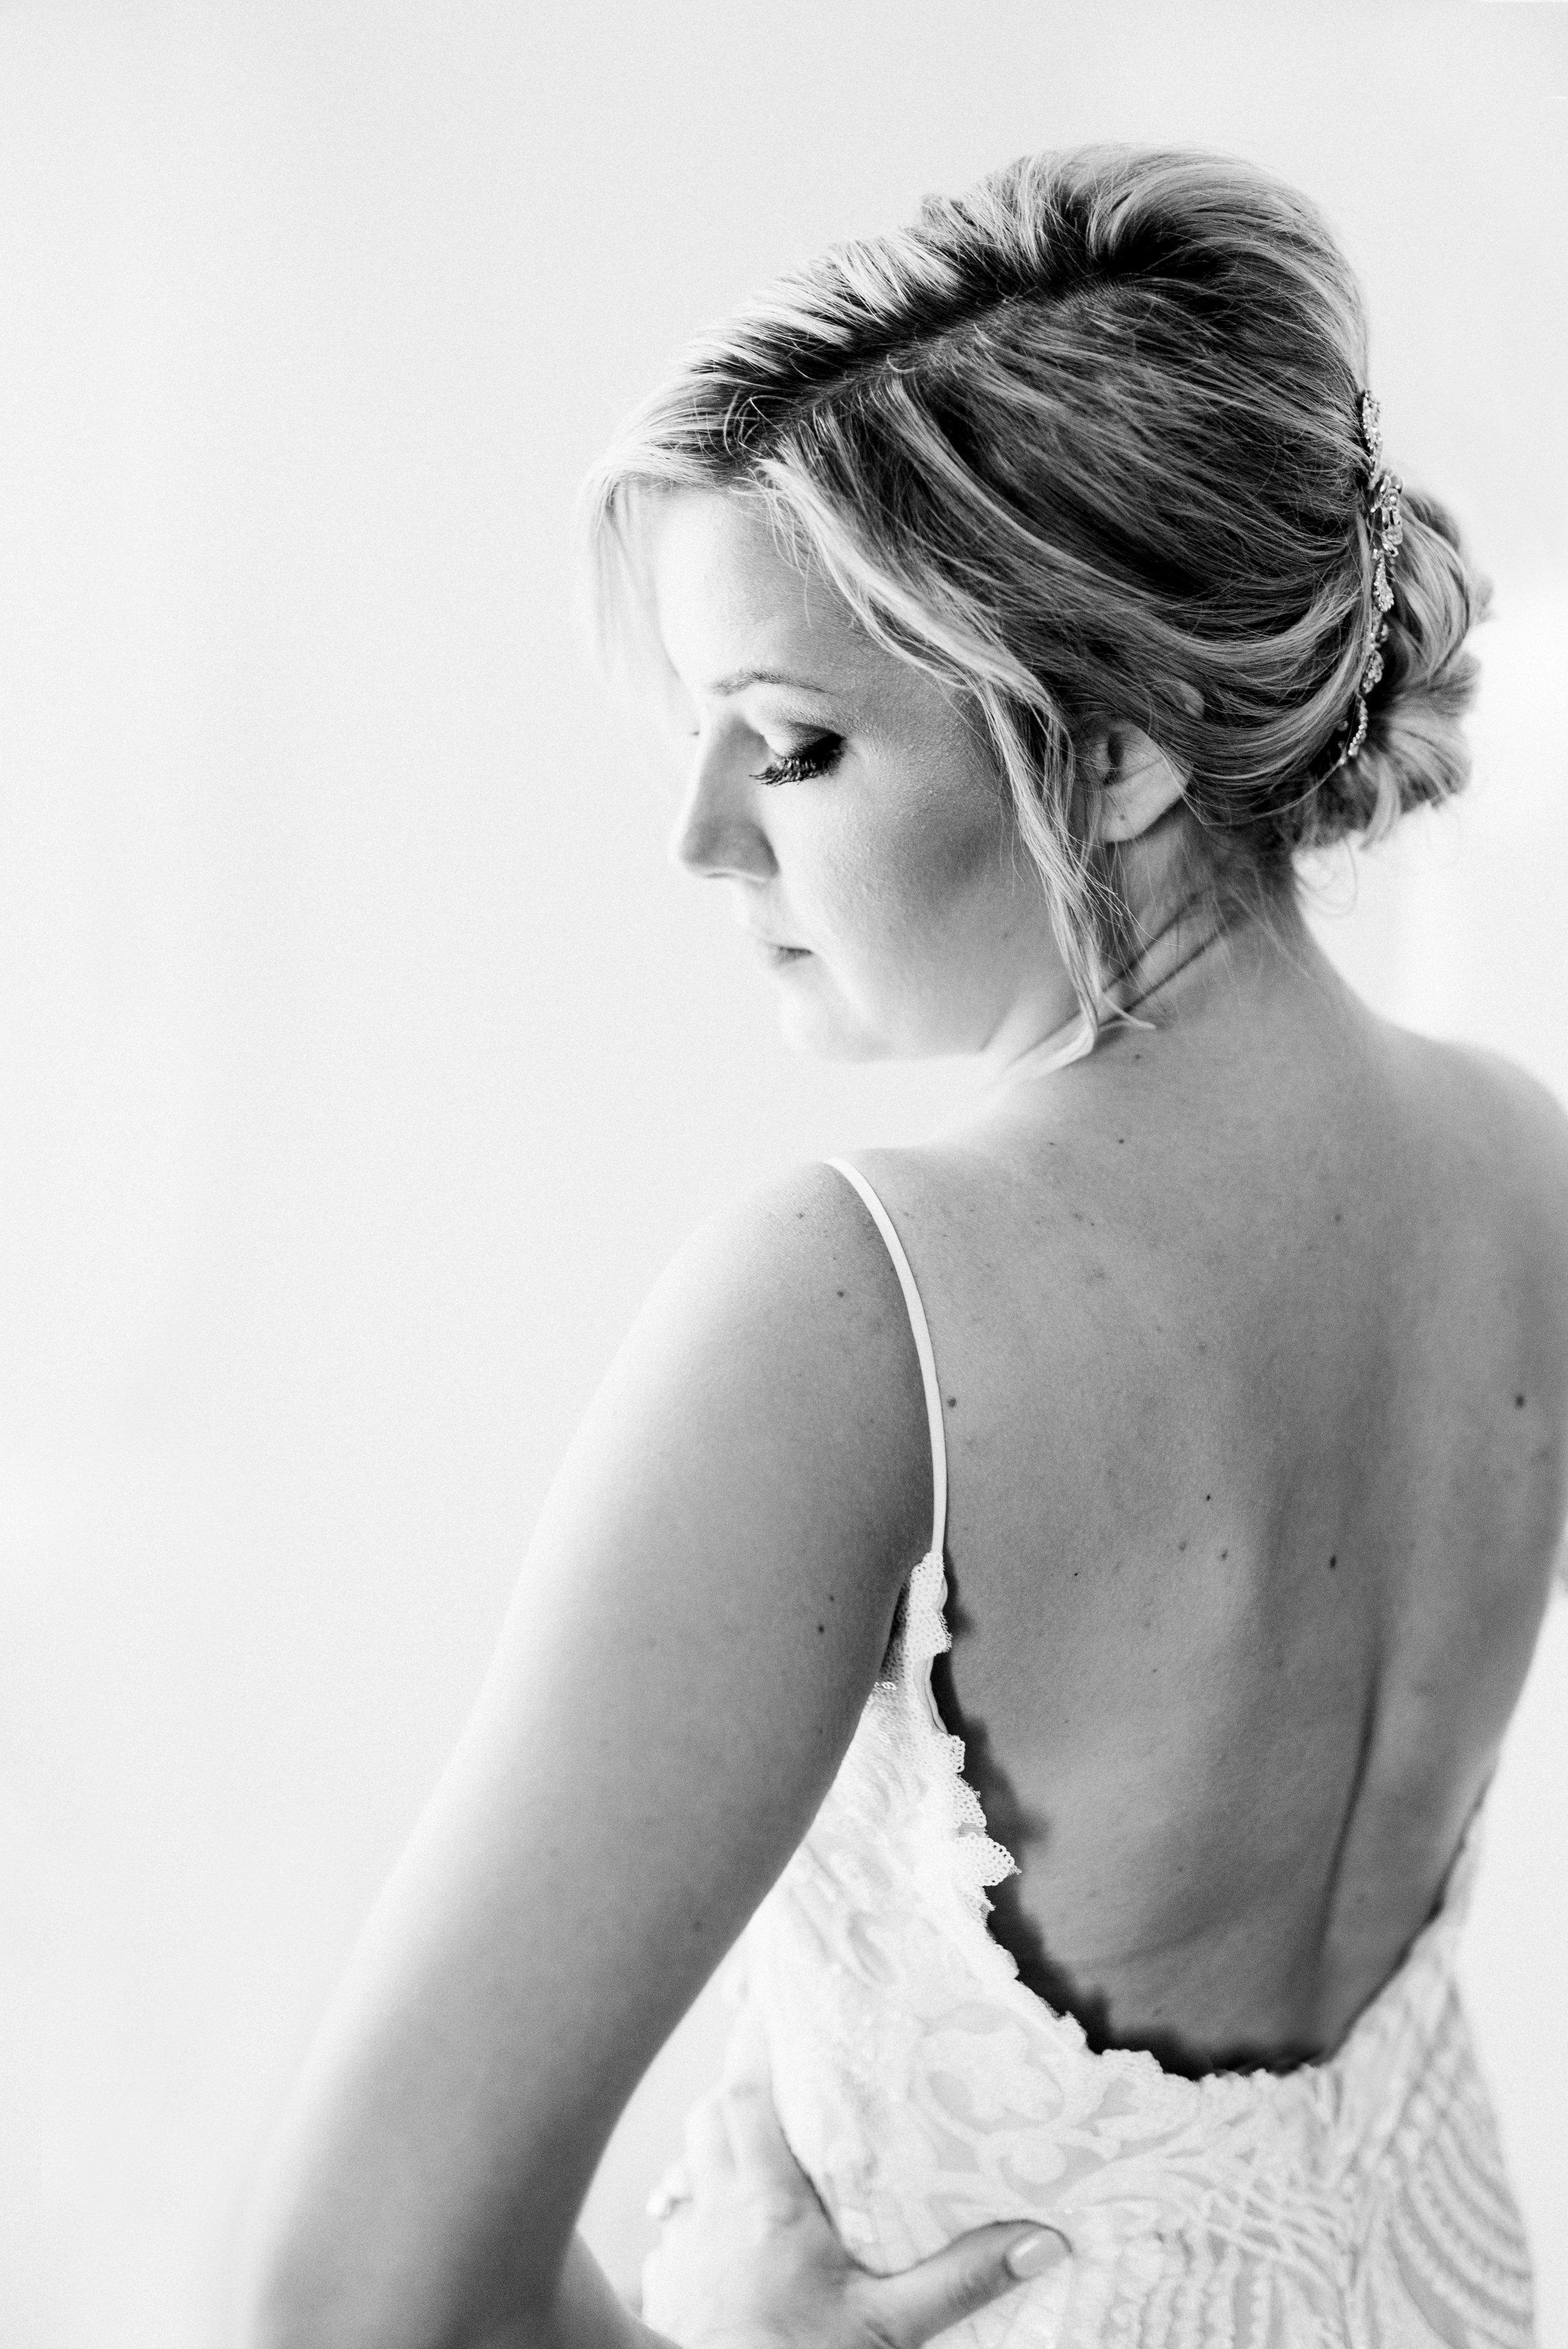 DavidAmandaMundy-Wedding-10282017-KathrynIvyPhotography-129.jpg